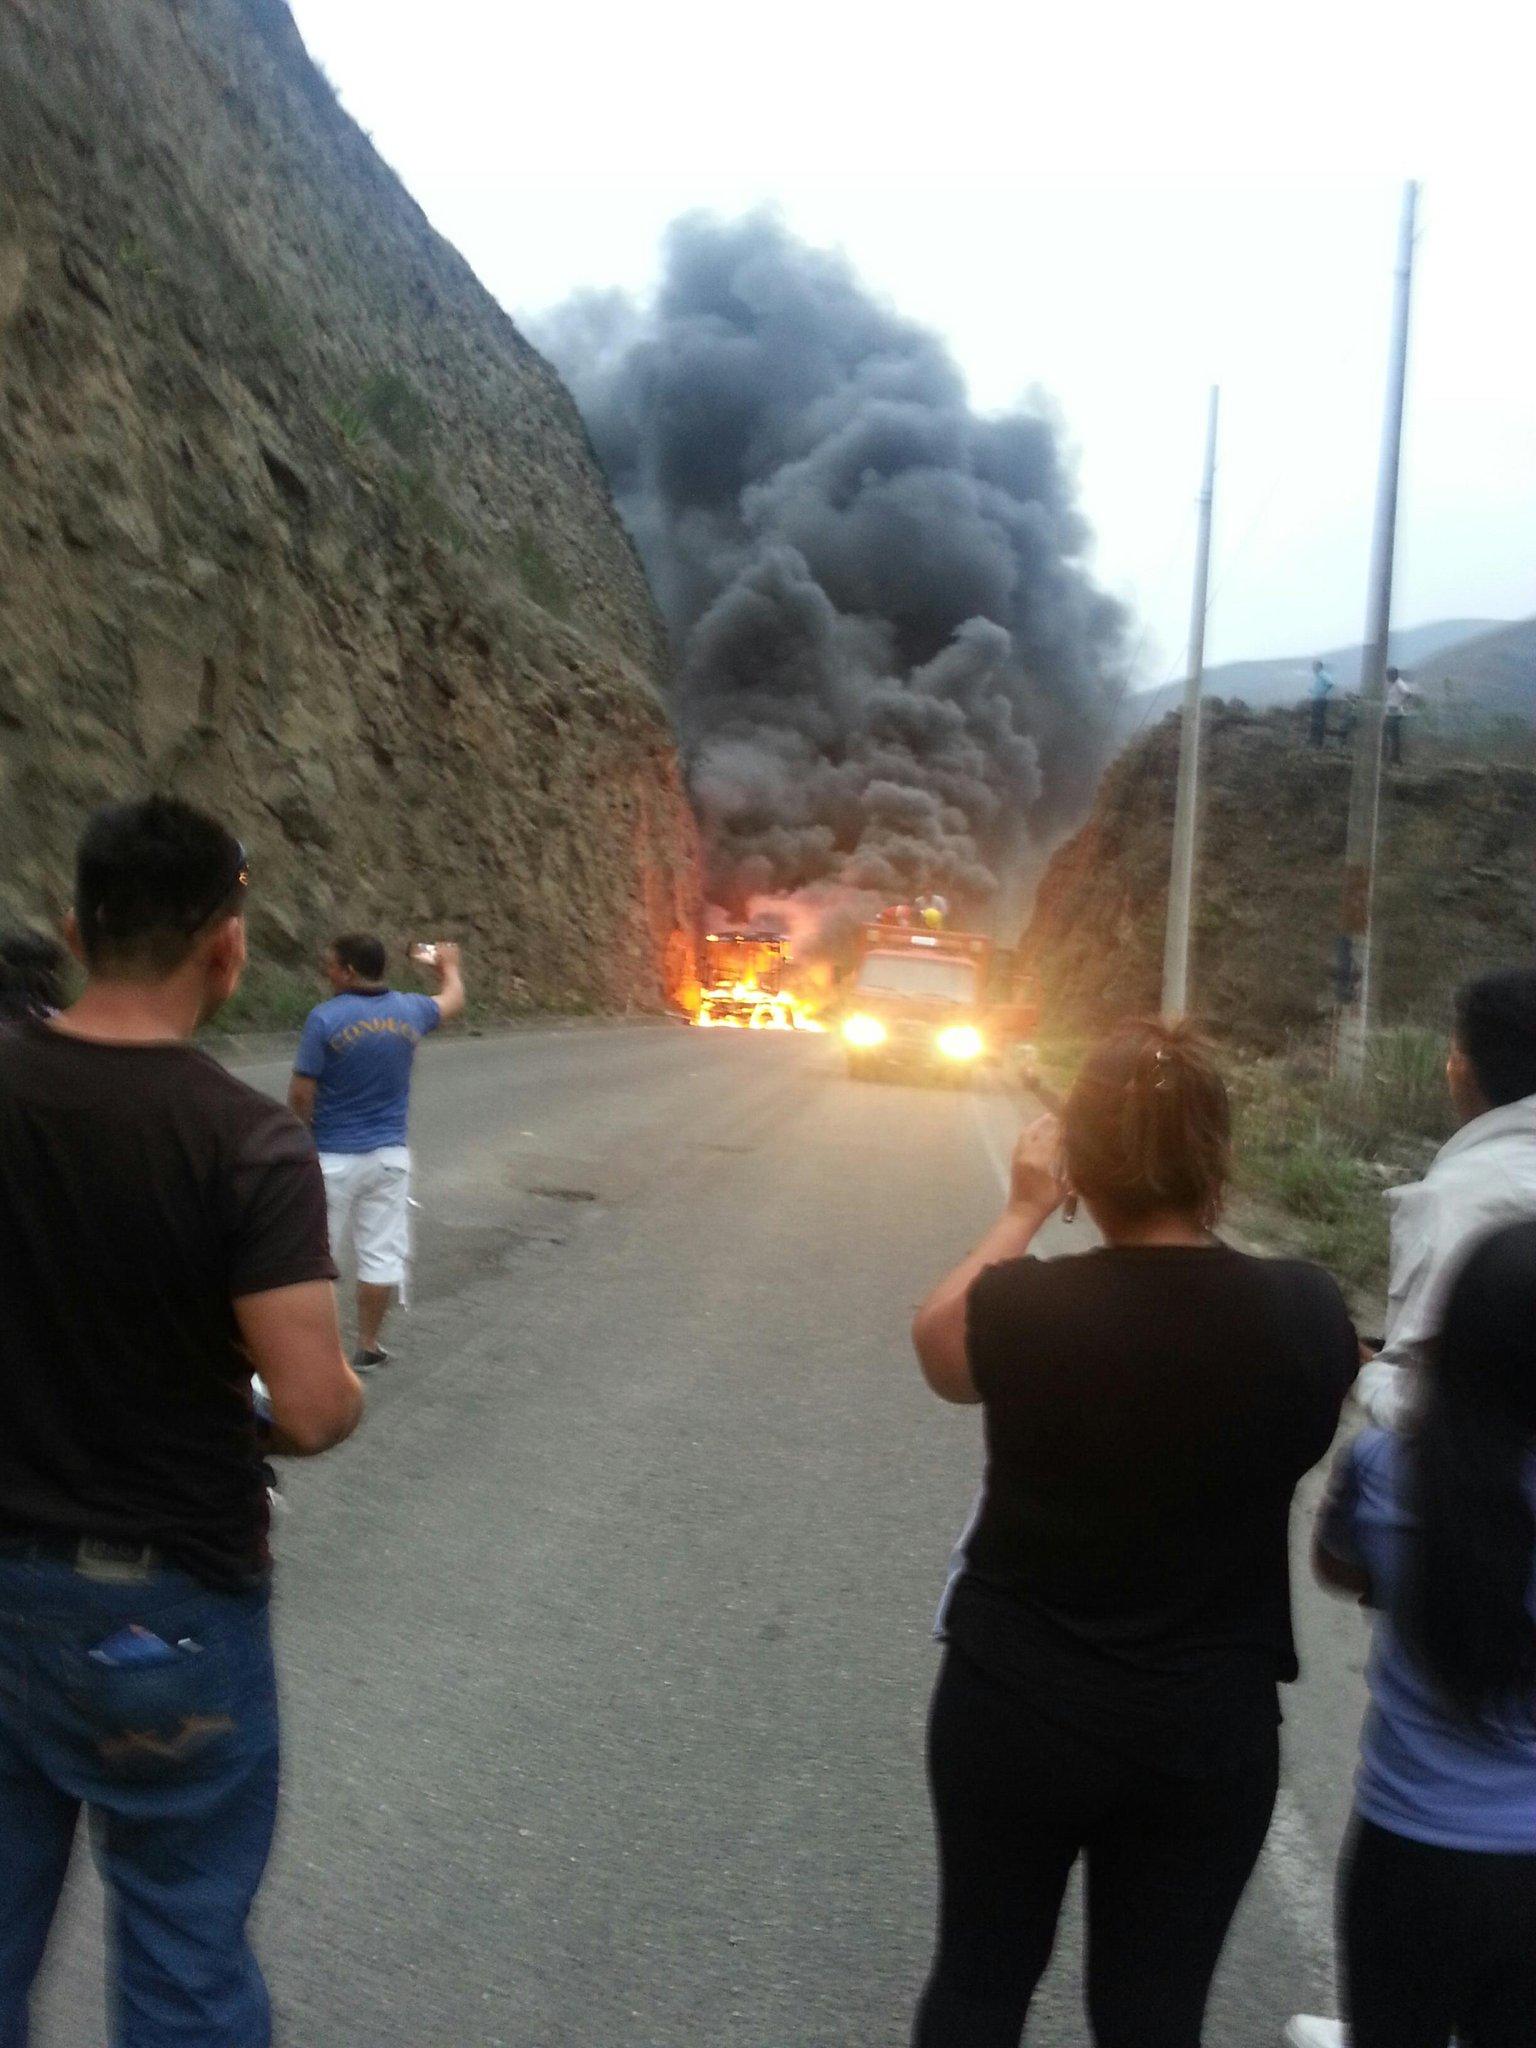 Se incendió un vehículo de RUTAS ORENSES a las 17 horas en el sector San Francisco cercano al cantón Santa Isabel http://t.co/vA3tbT24vP